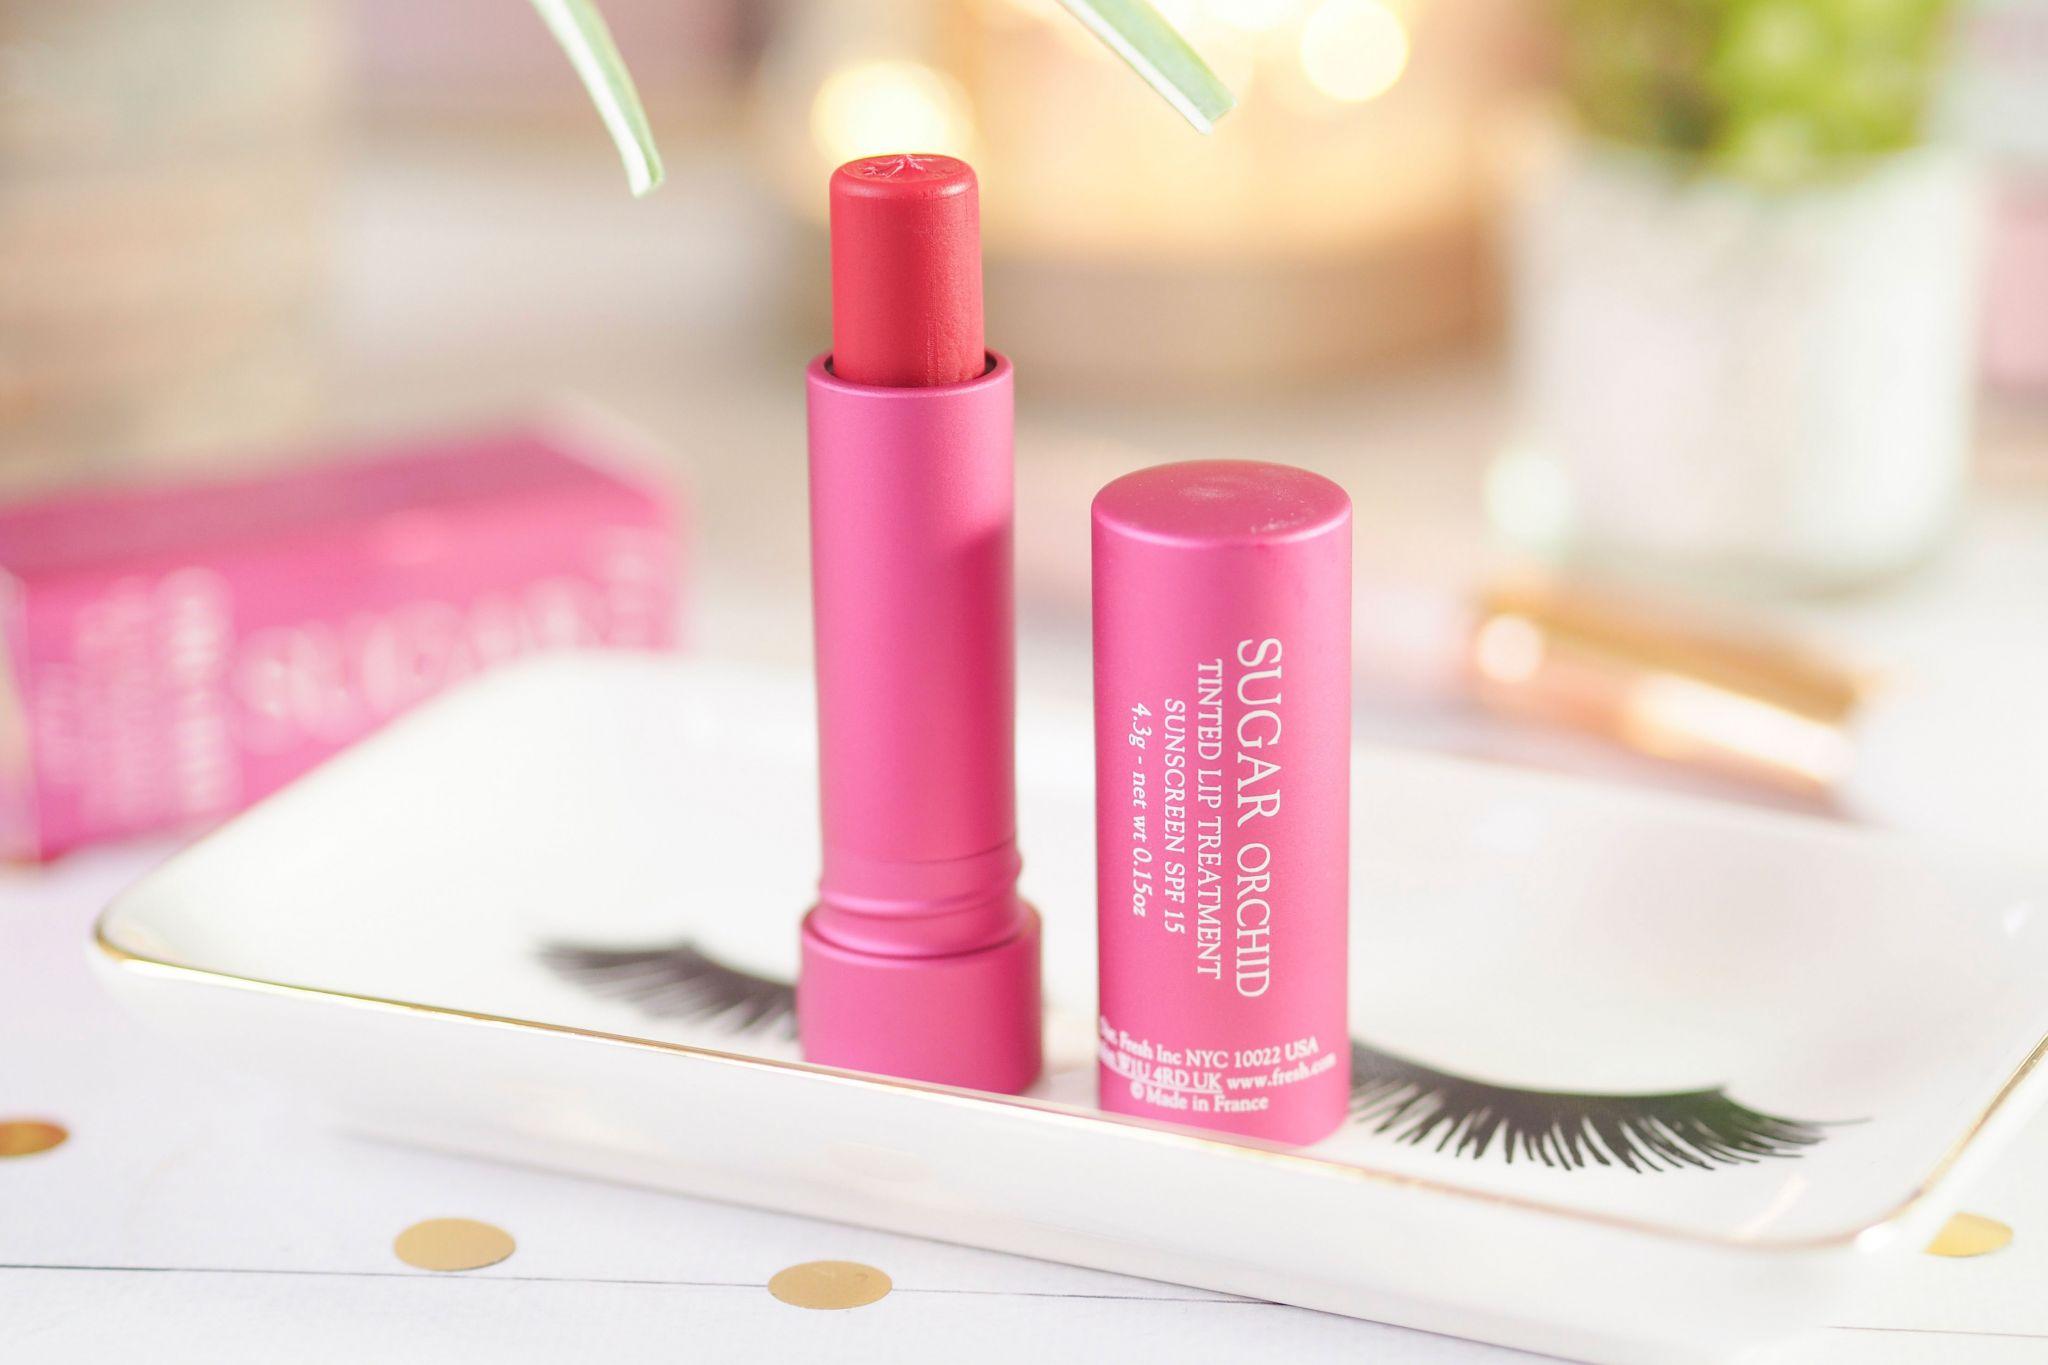 Fresh Sugar Orchid Tinted Lip Treatment